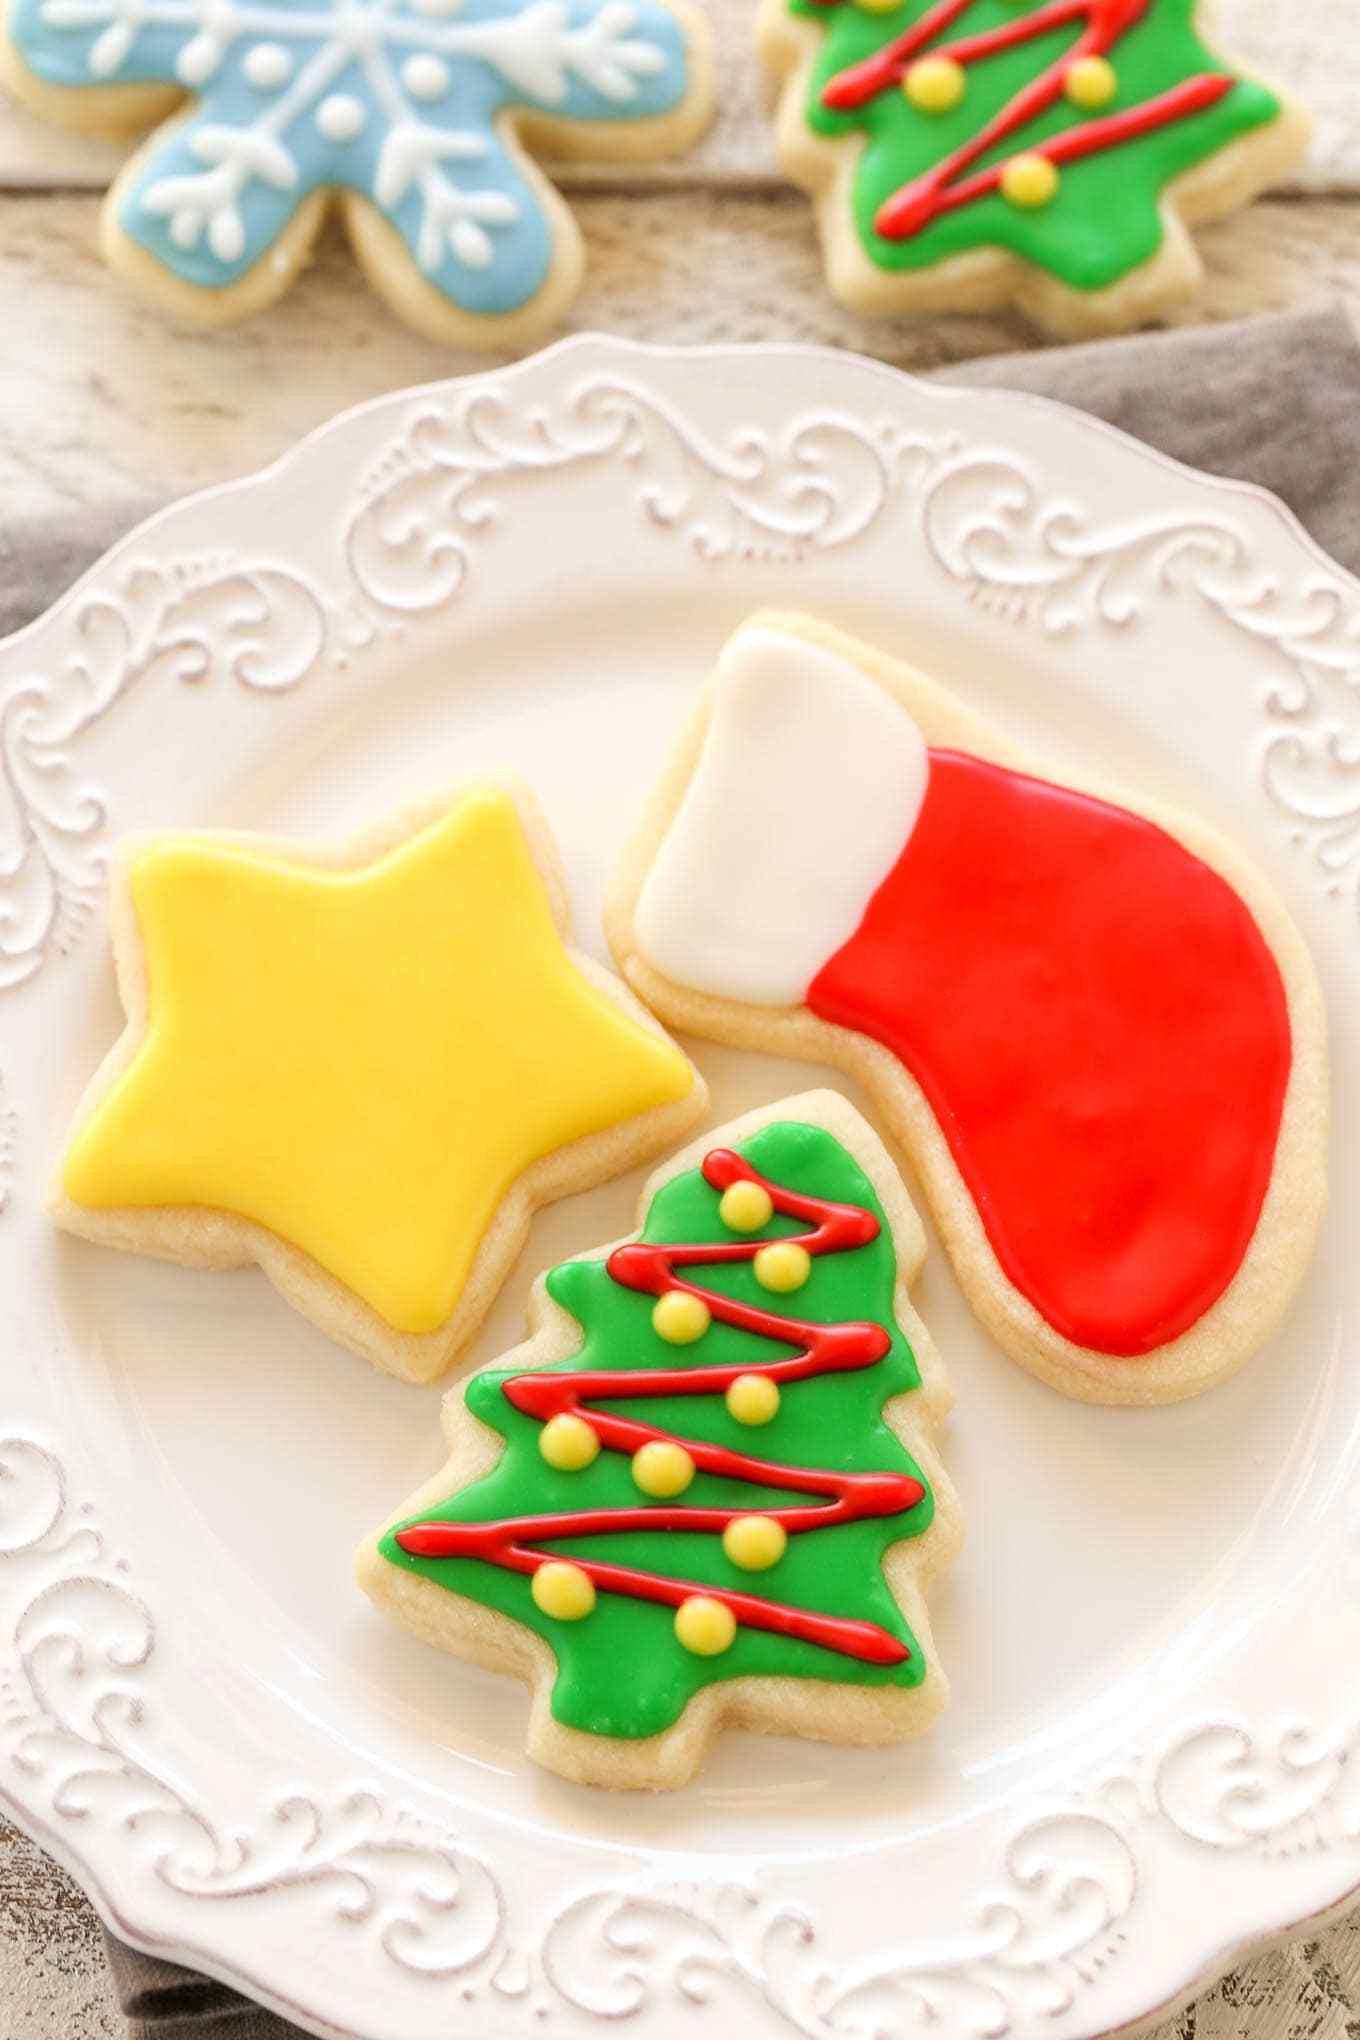 Sugar Cookies Christmas  Soft Christmas Cut Out Sugar Cookies Live Well Bake ten